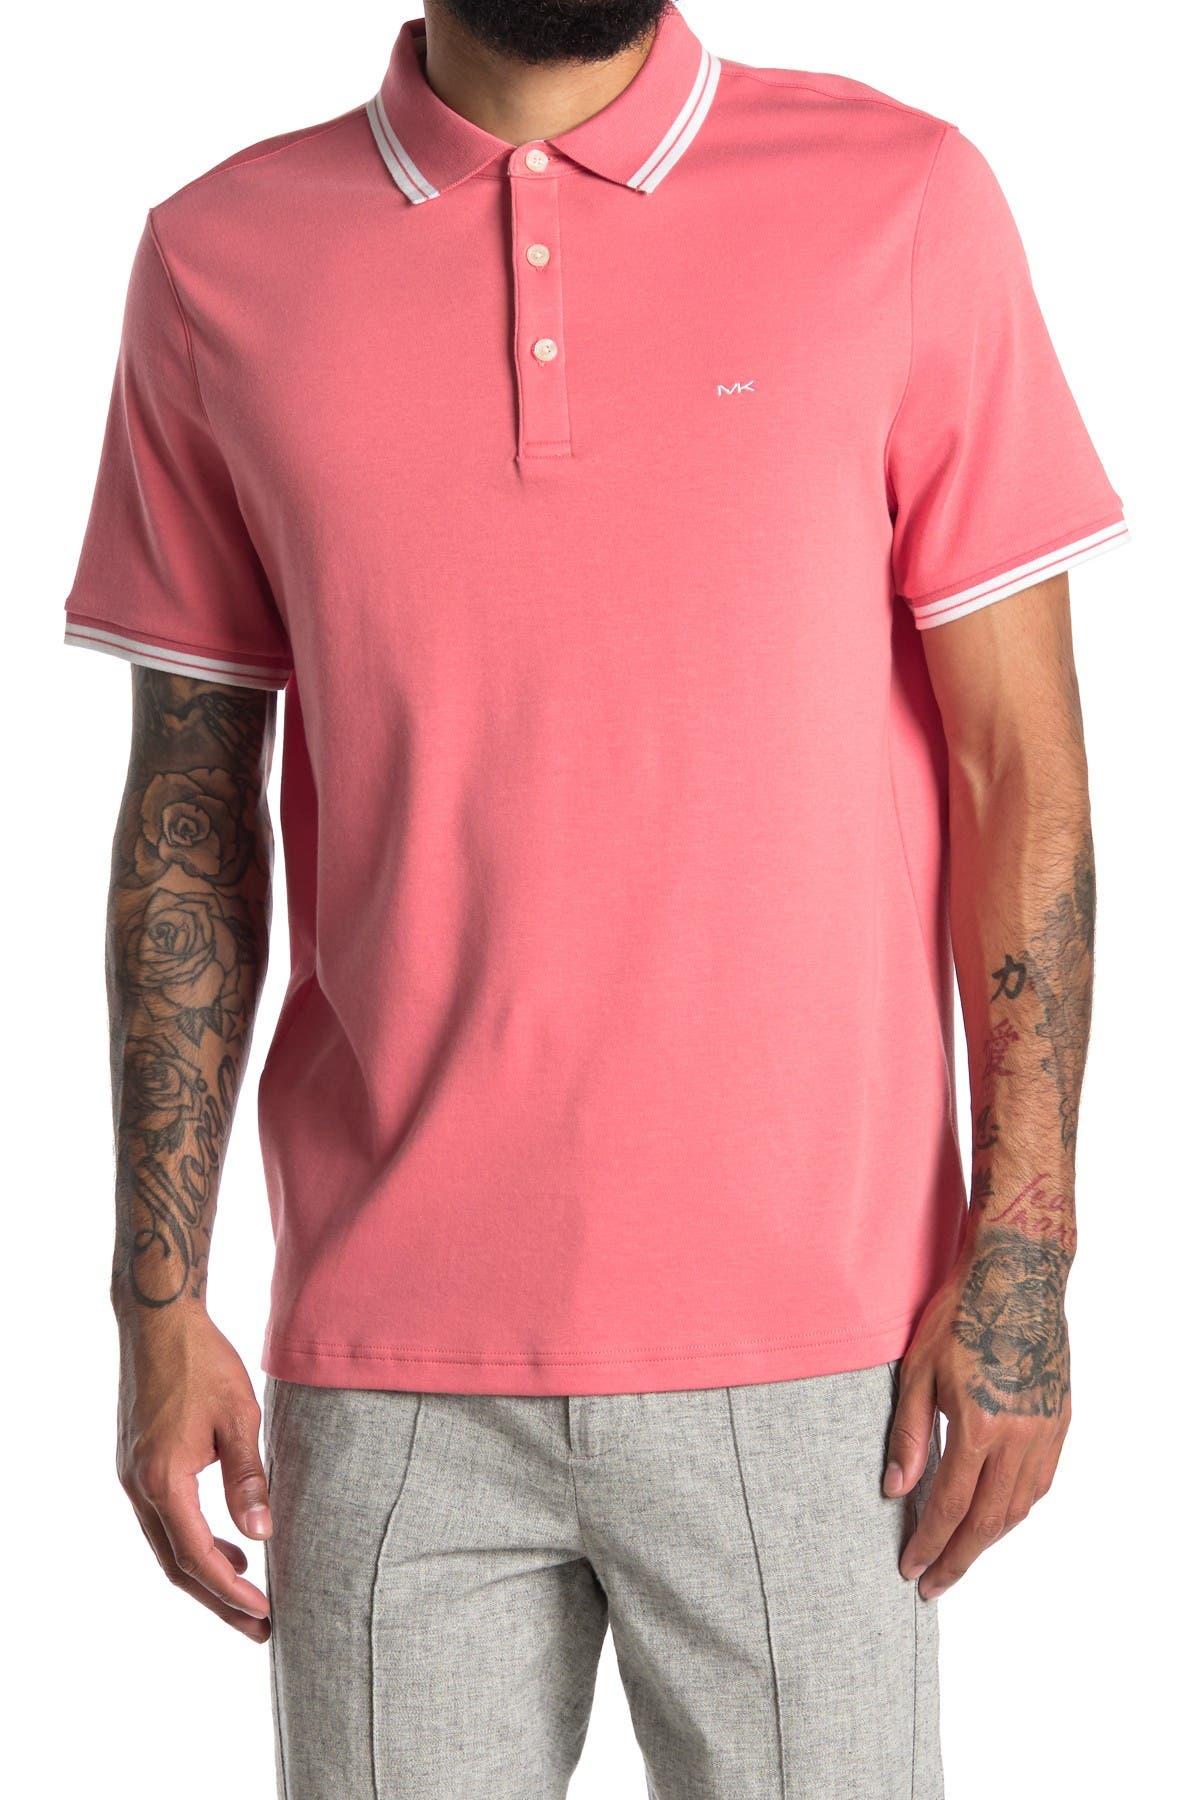 Image of Michael Kors Greenwhich Knit Polo Shirt